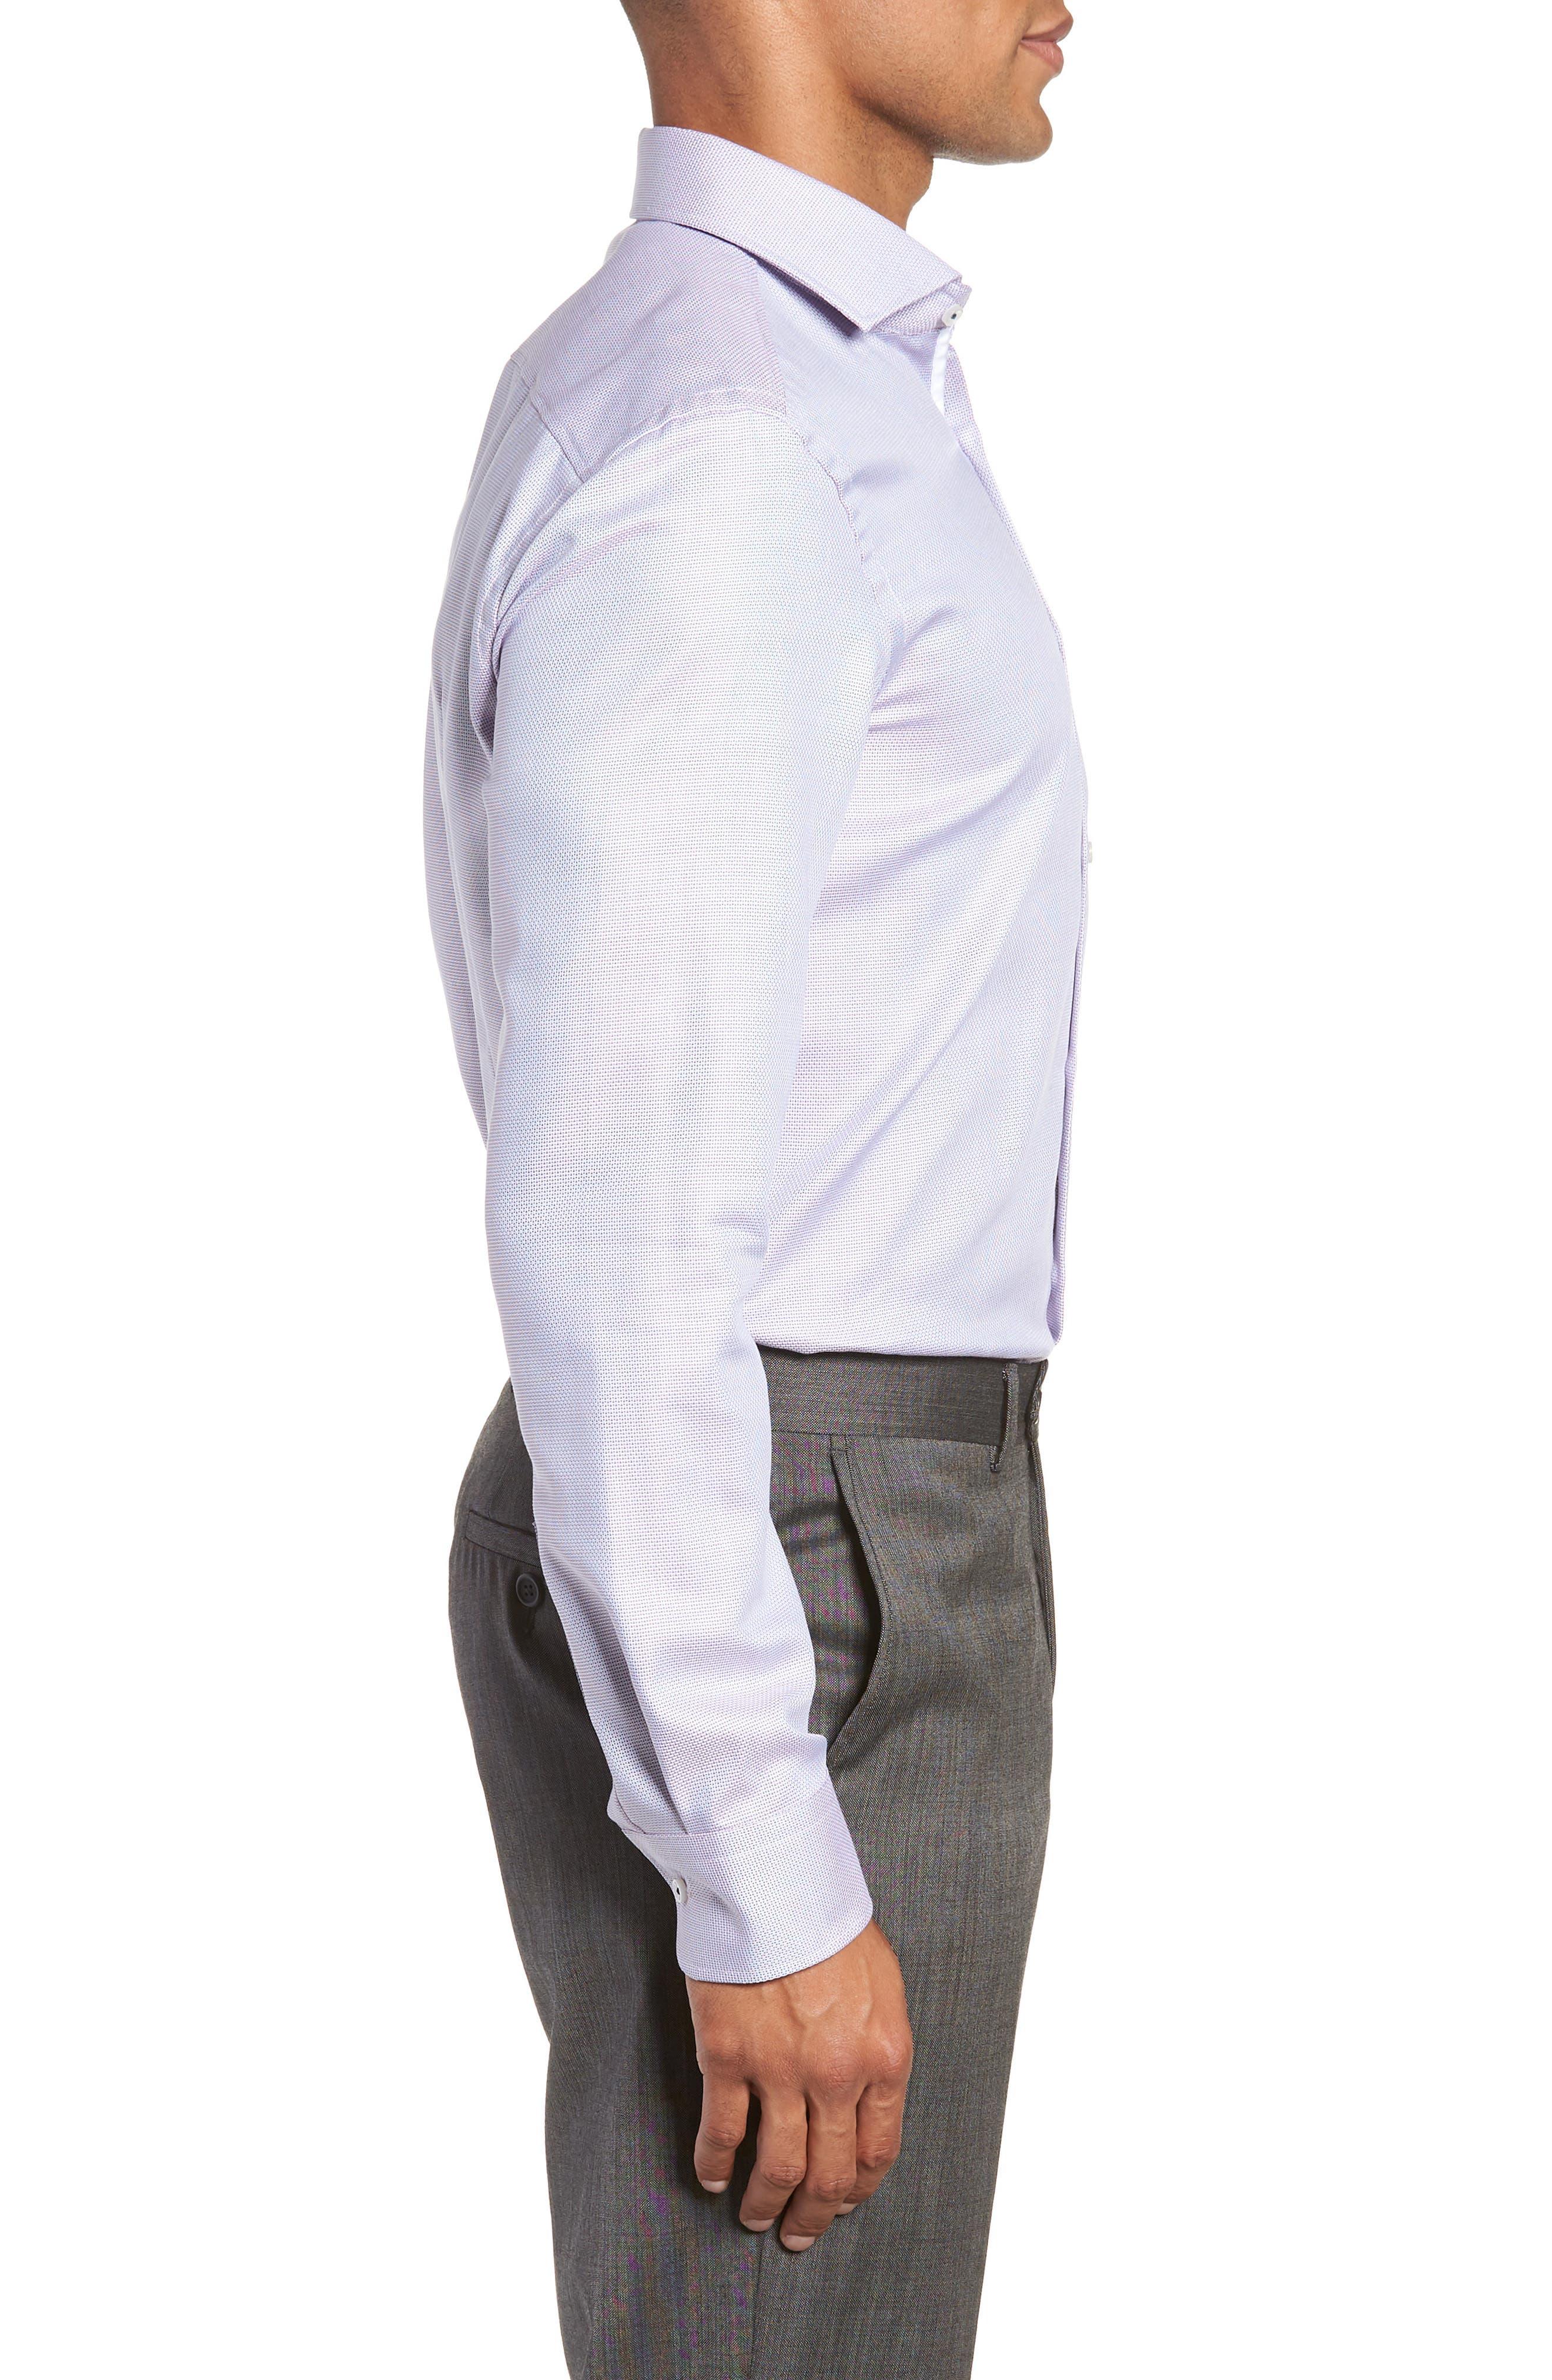 x Nordstrom Jerrin Slim Fit Solid Dress Shirt,                             Alternate thumbnail 4, color,                             LAVENDER